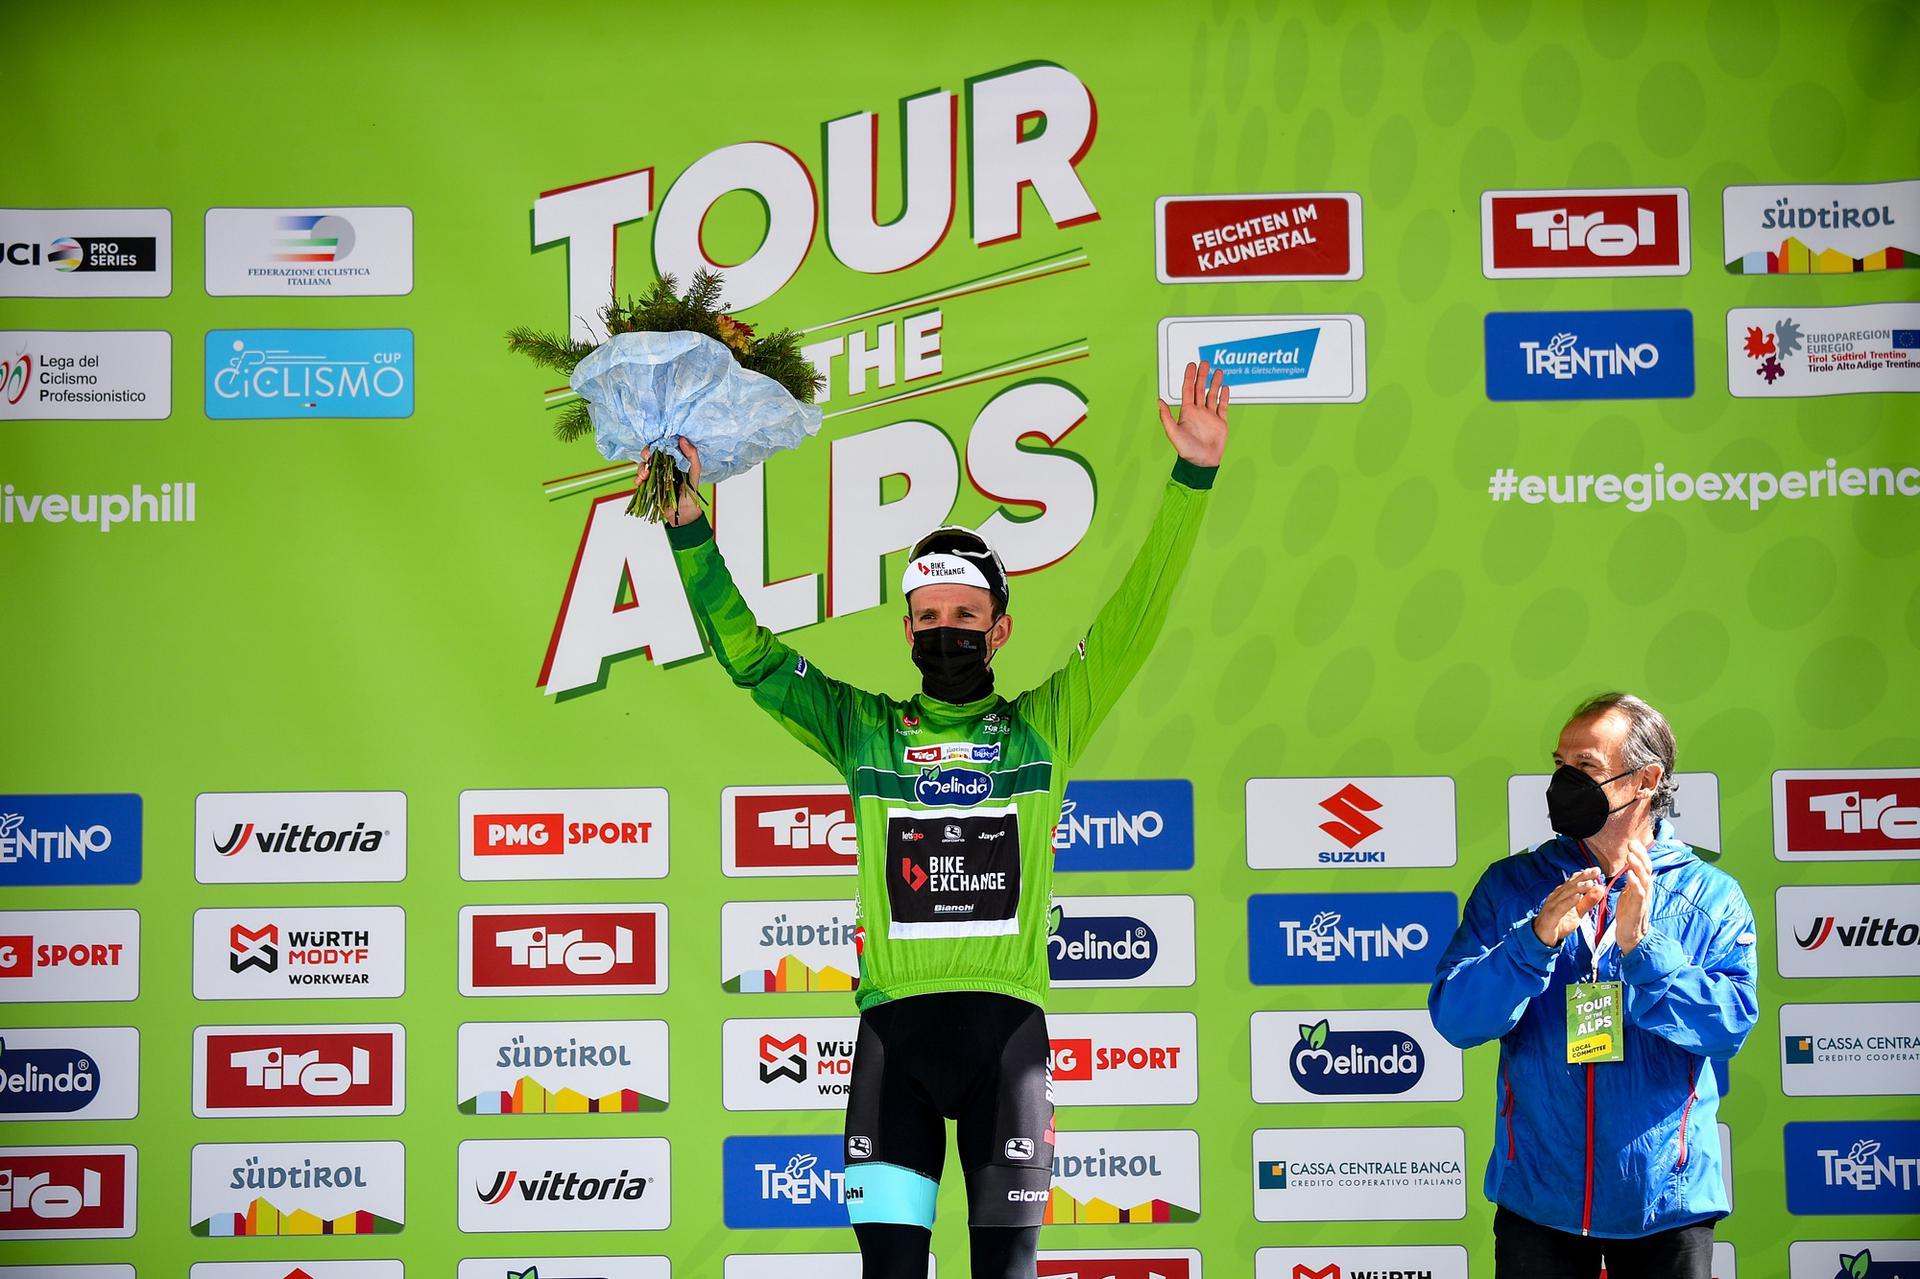 Simon Yates nuovo leader del Tour of the Alps 2021 (foto BettiniPhoto)